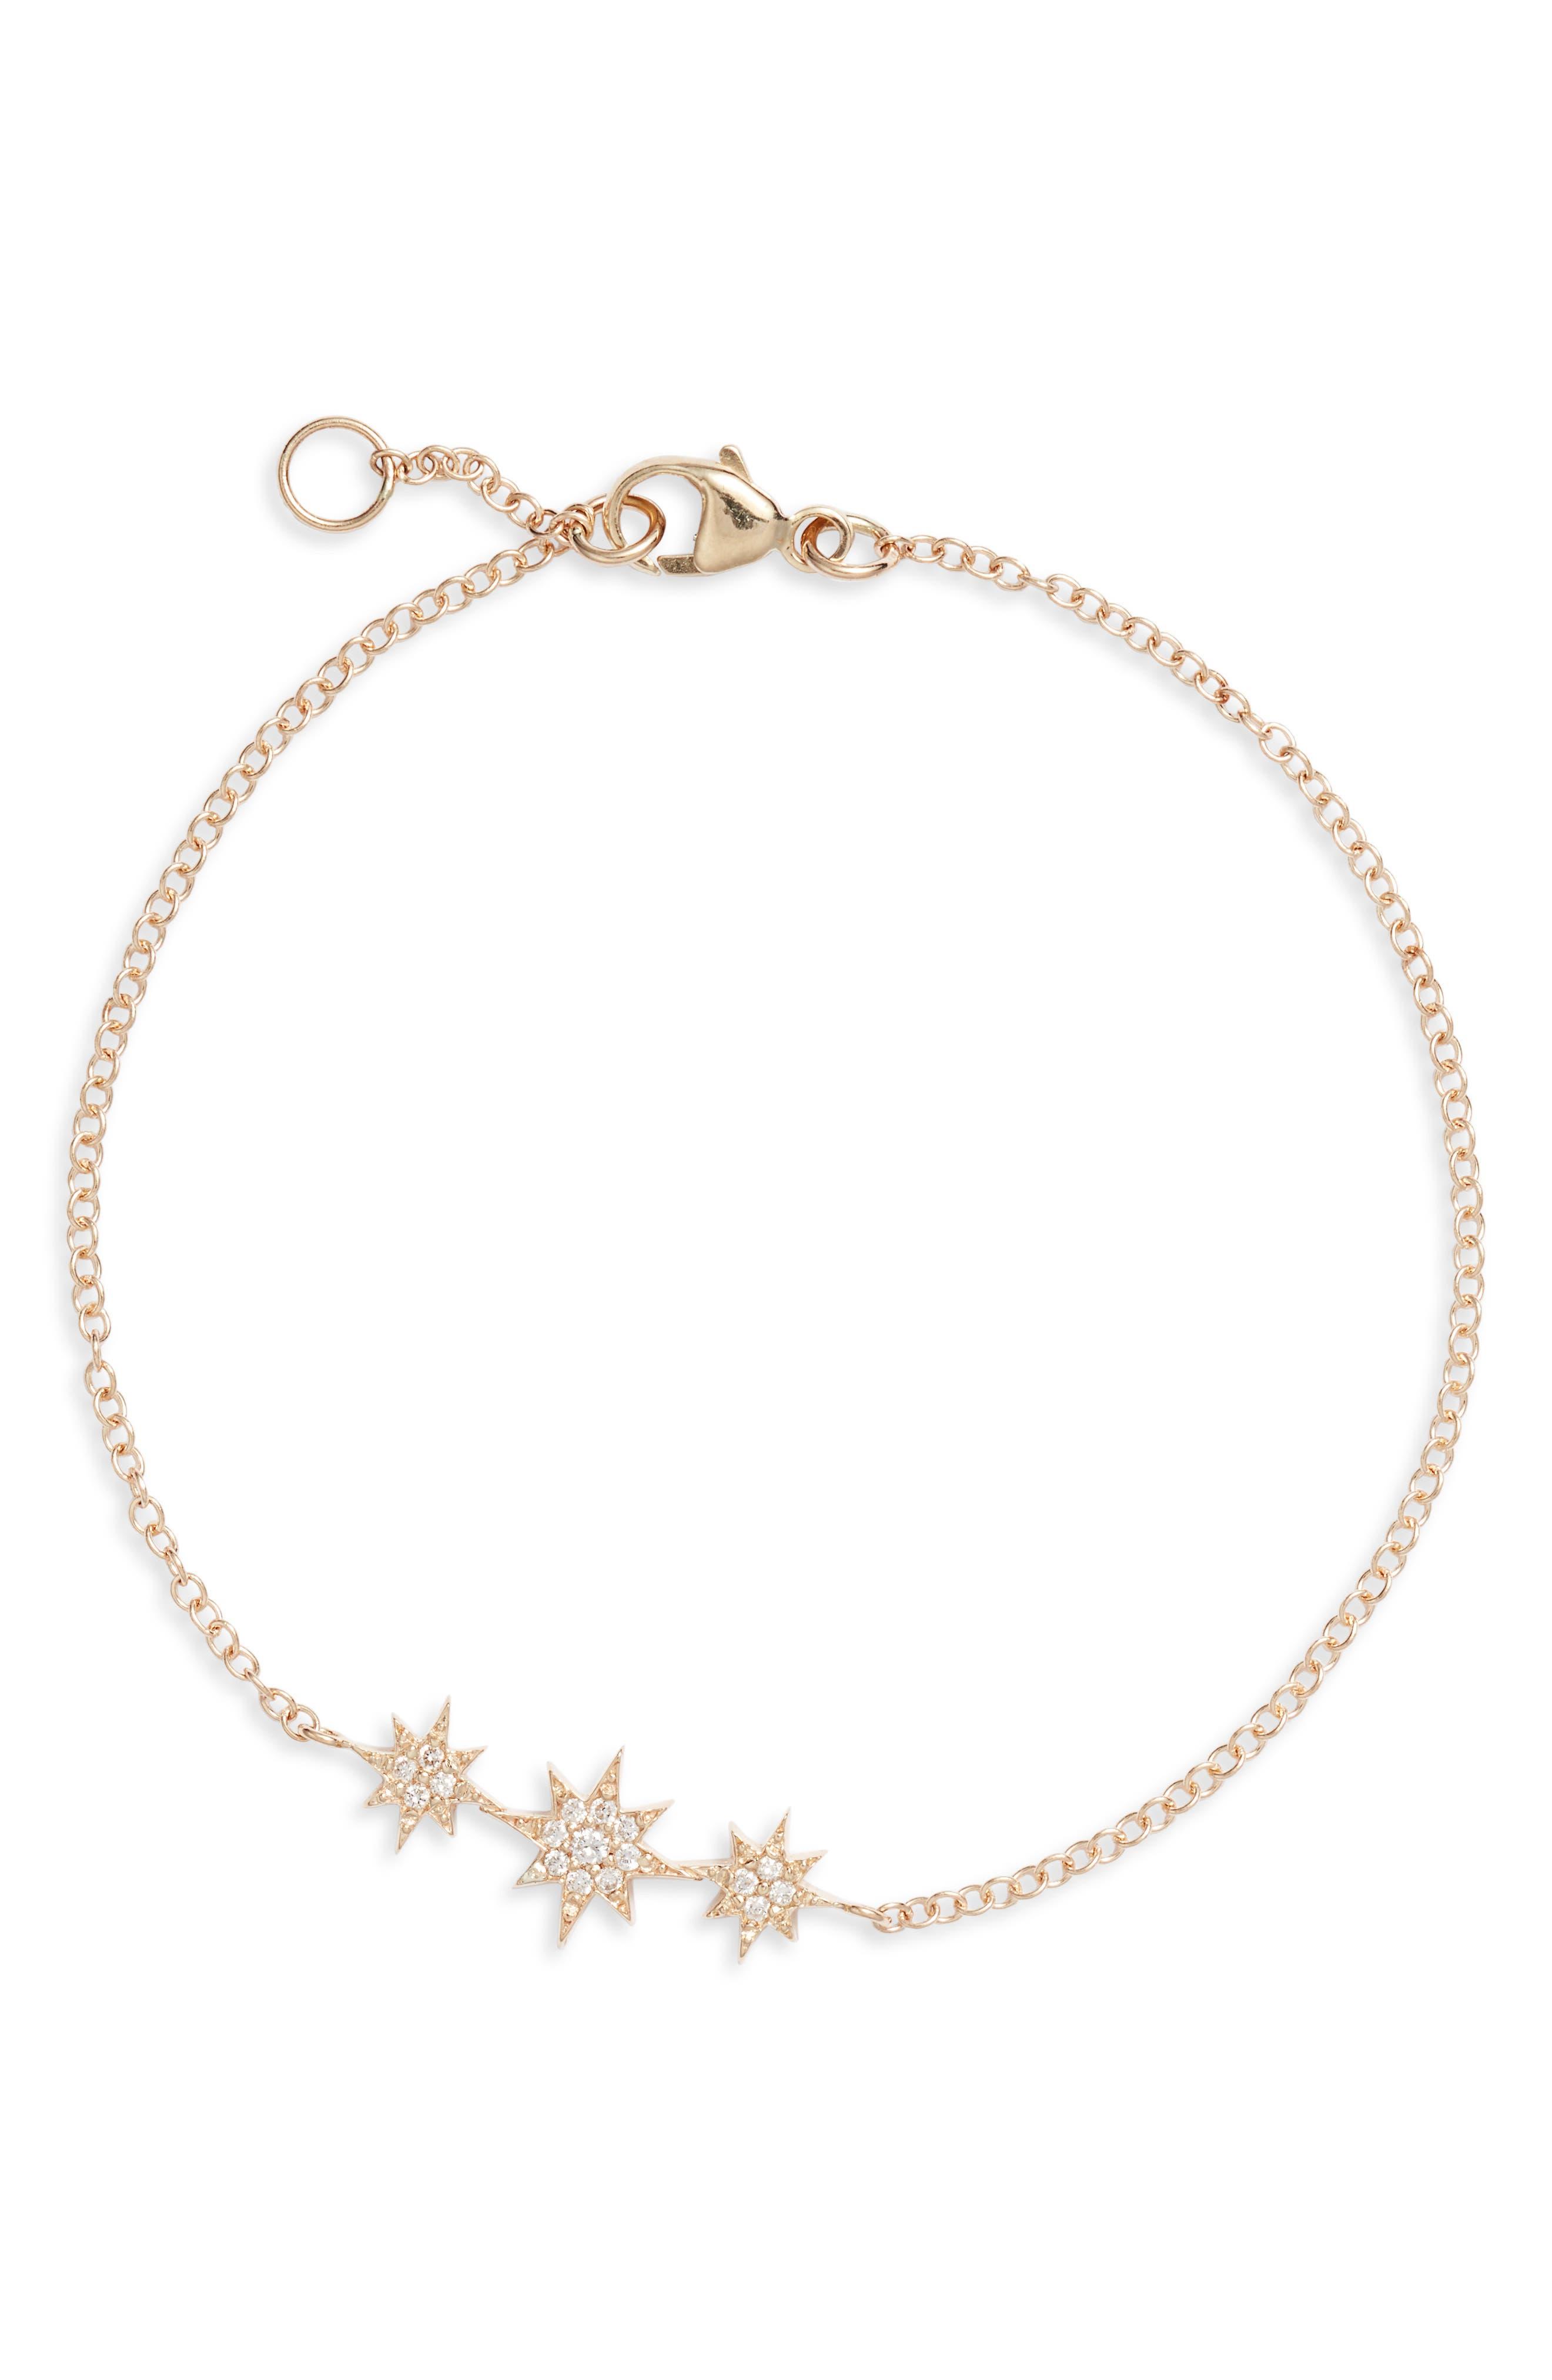 North Star Diamond Bracelet